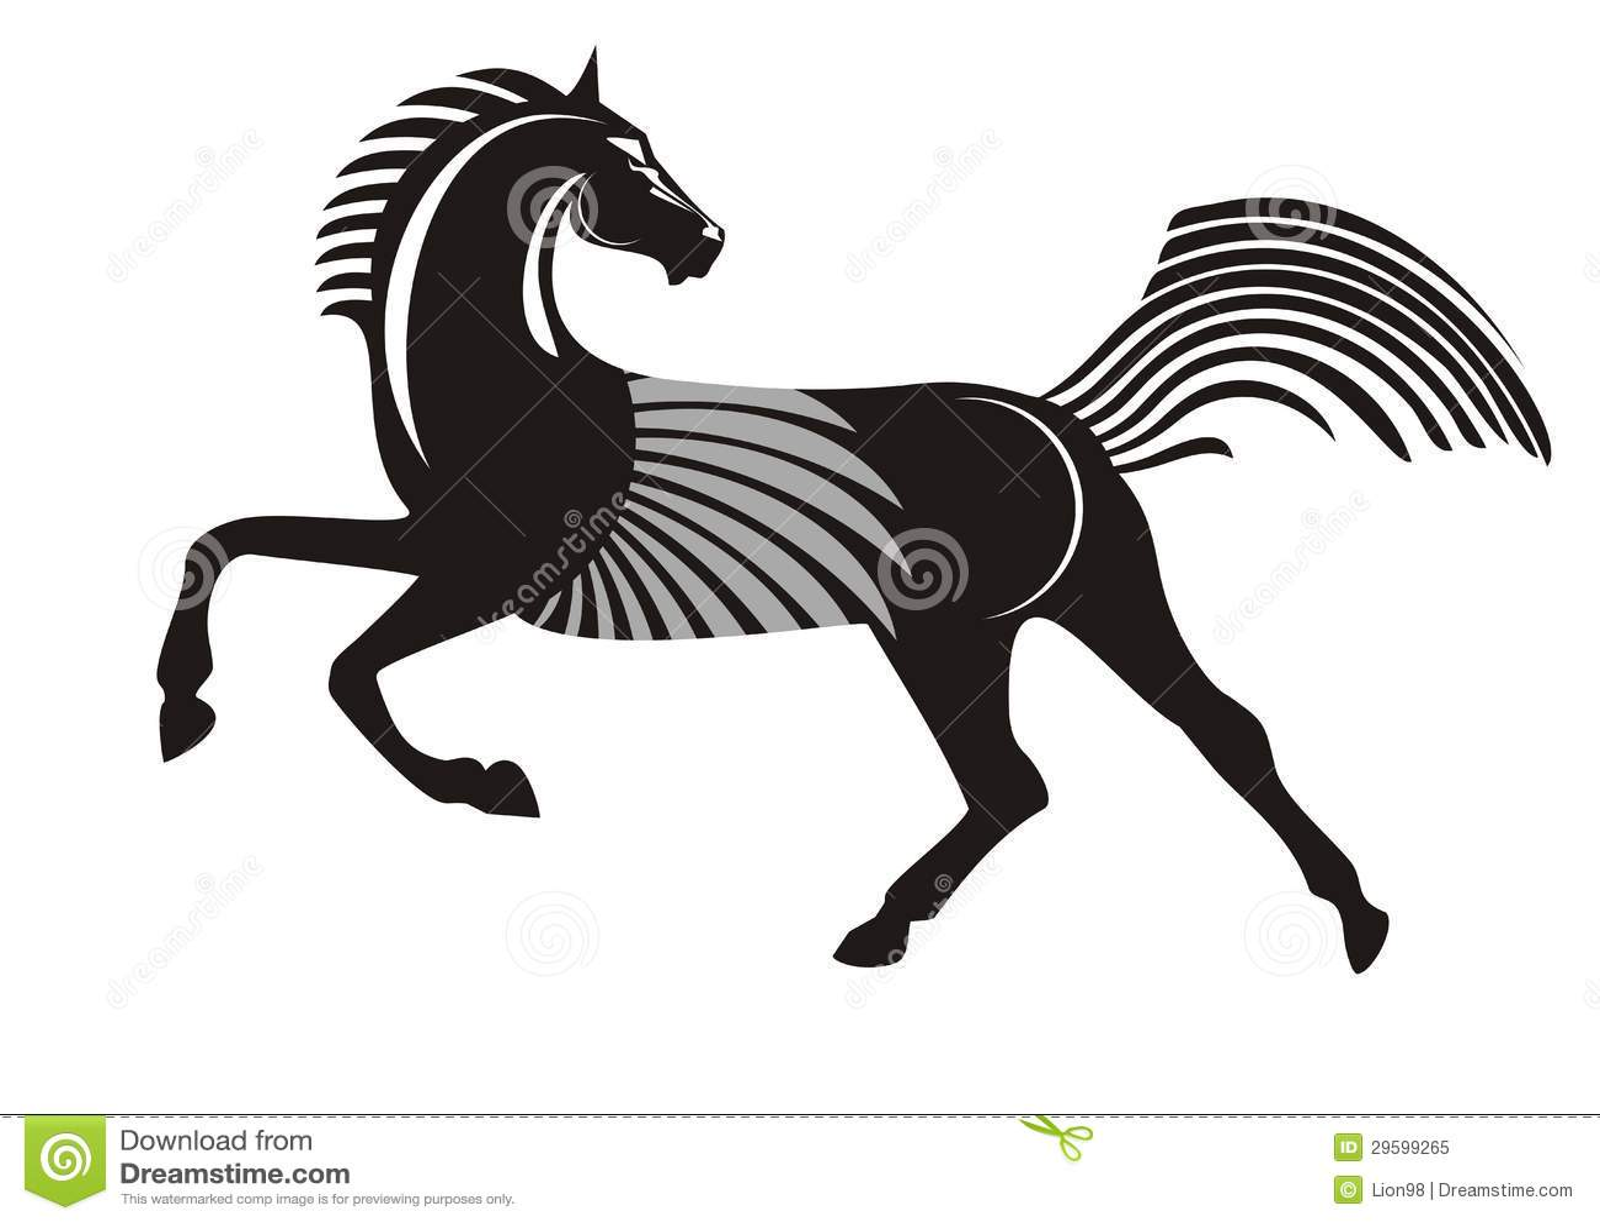 Black Running Horse Royalty Free Stock Photo